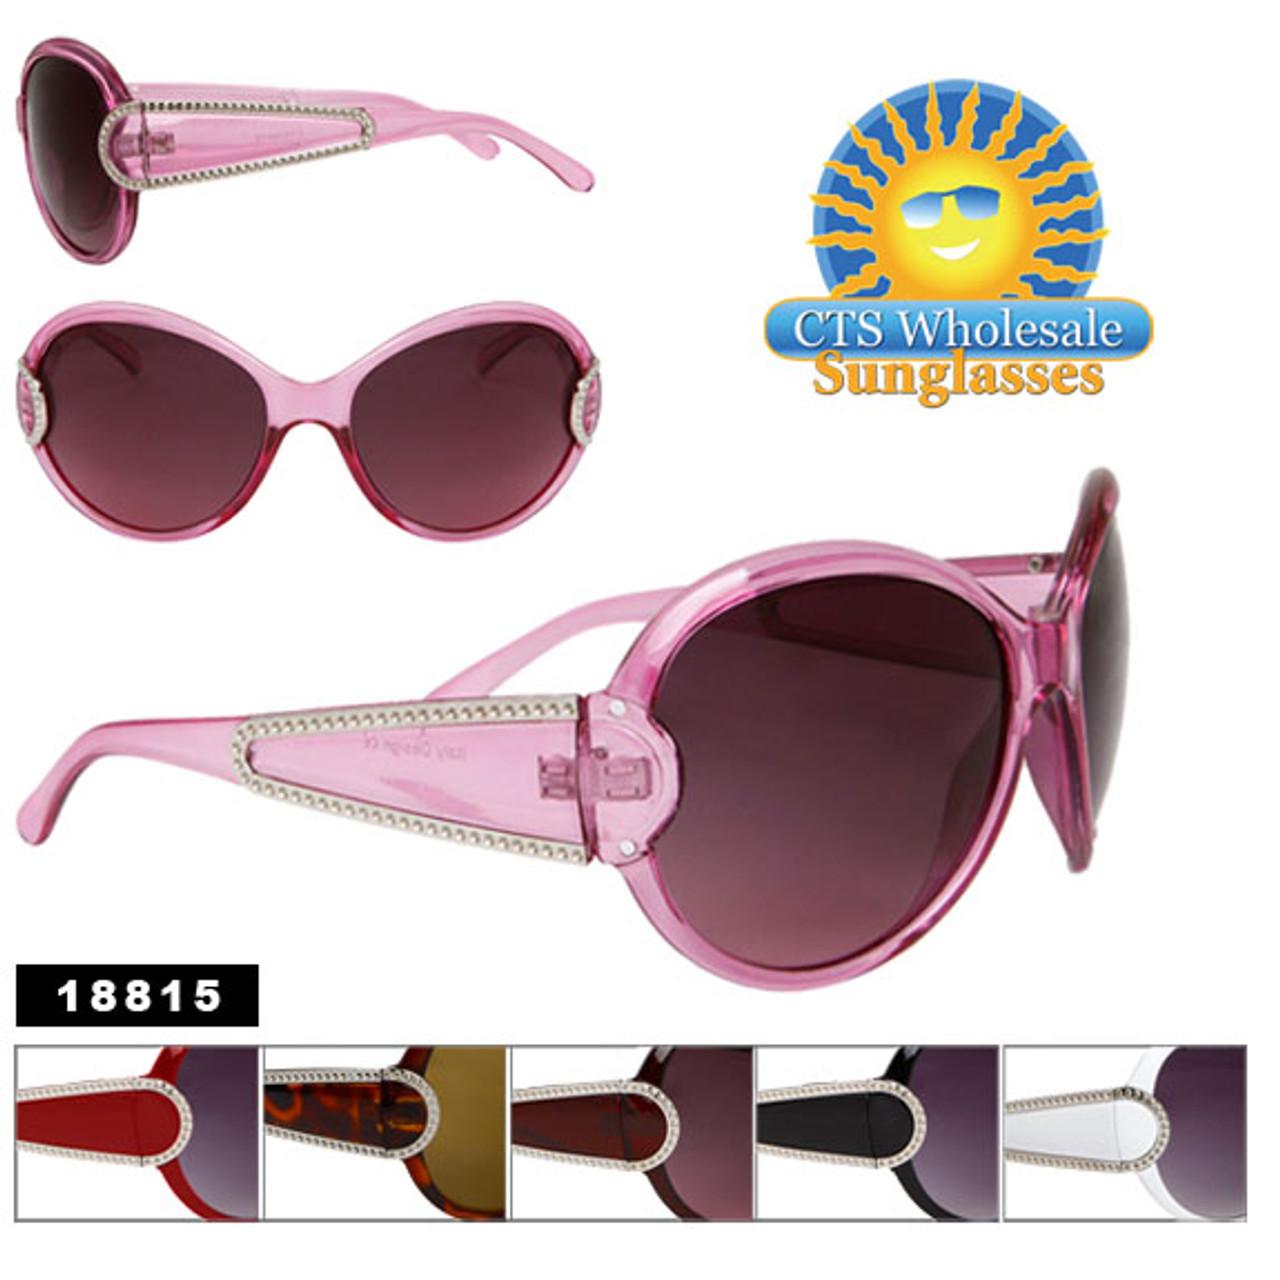 Cute Women's Fashion Sunglasses